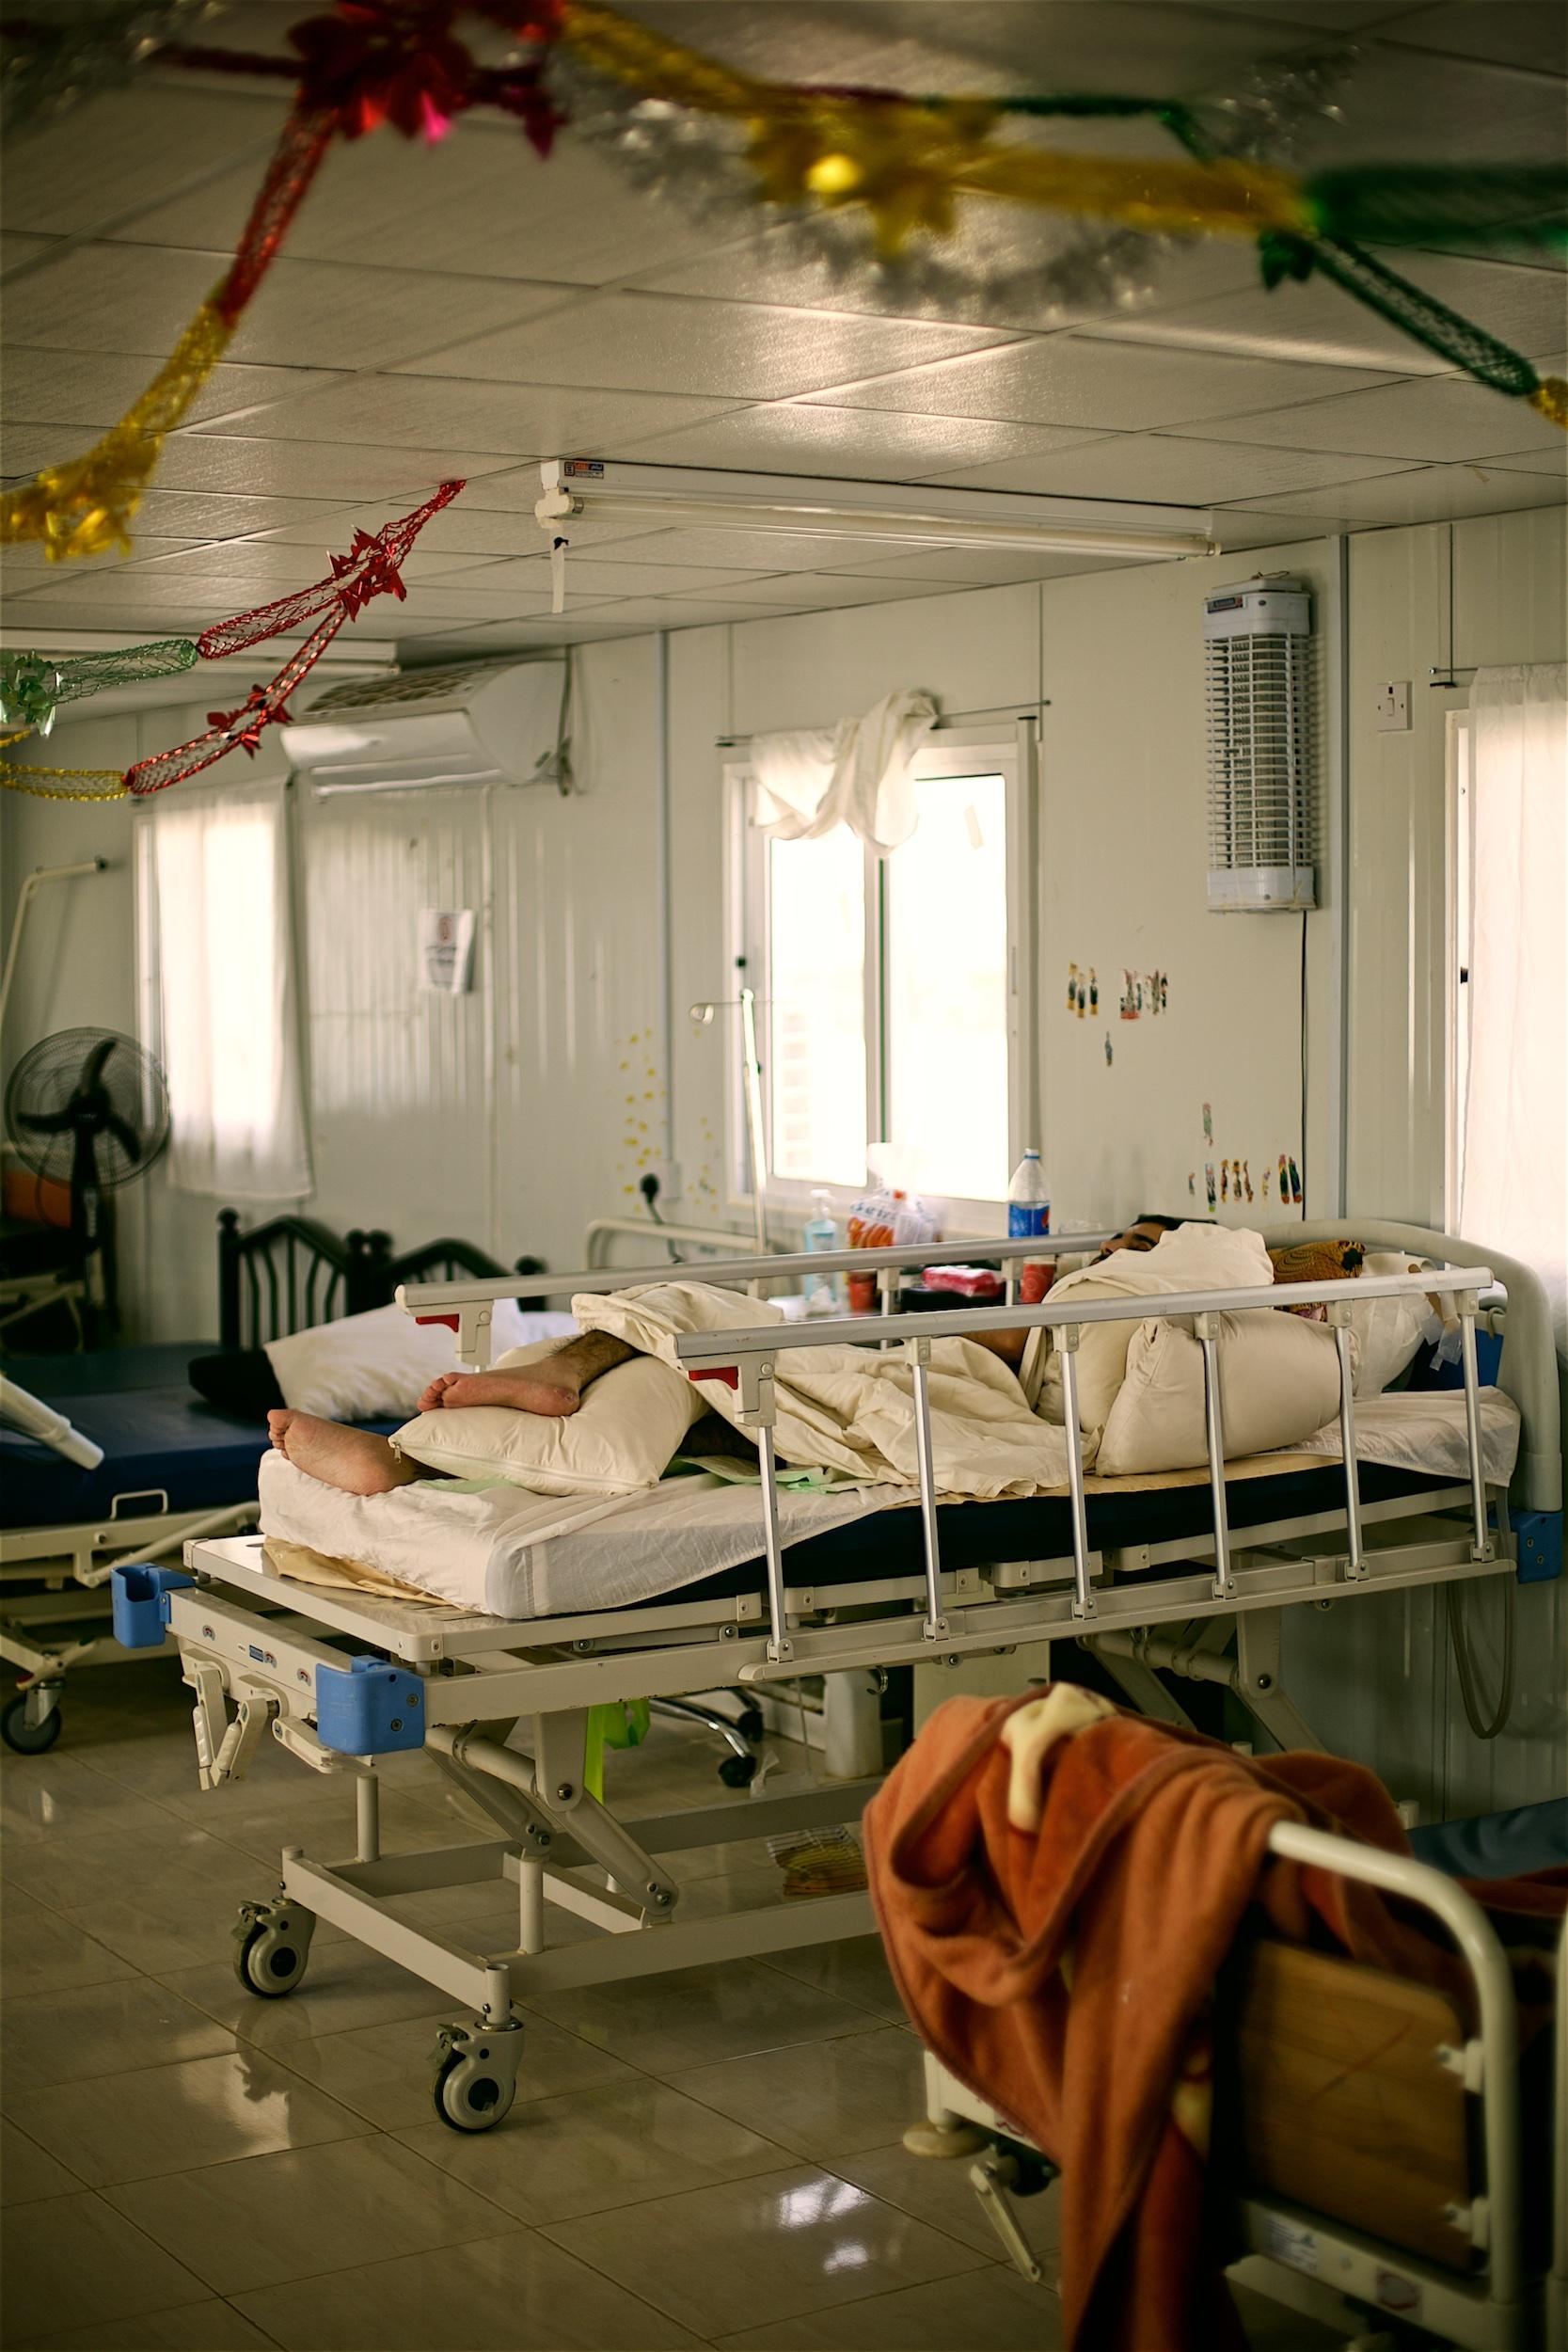 jordan-msf-zaatari-dectors-without-borders-war-hospital-refugee-camp-denis-bosnic-3.jpg